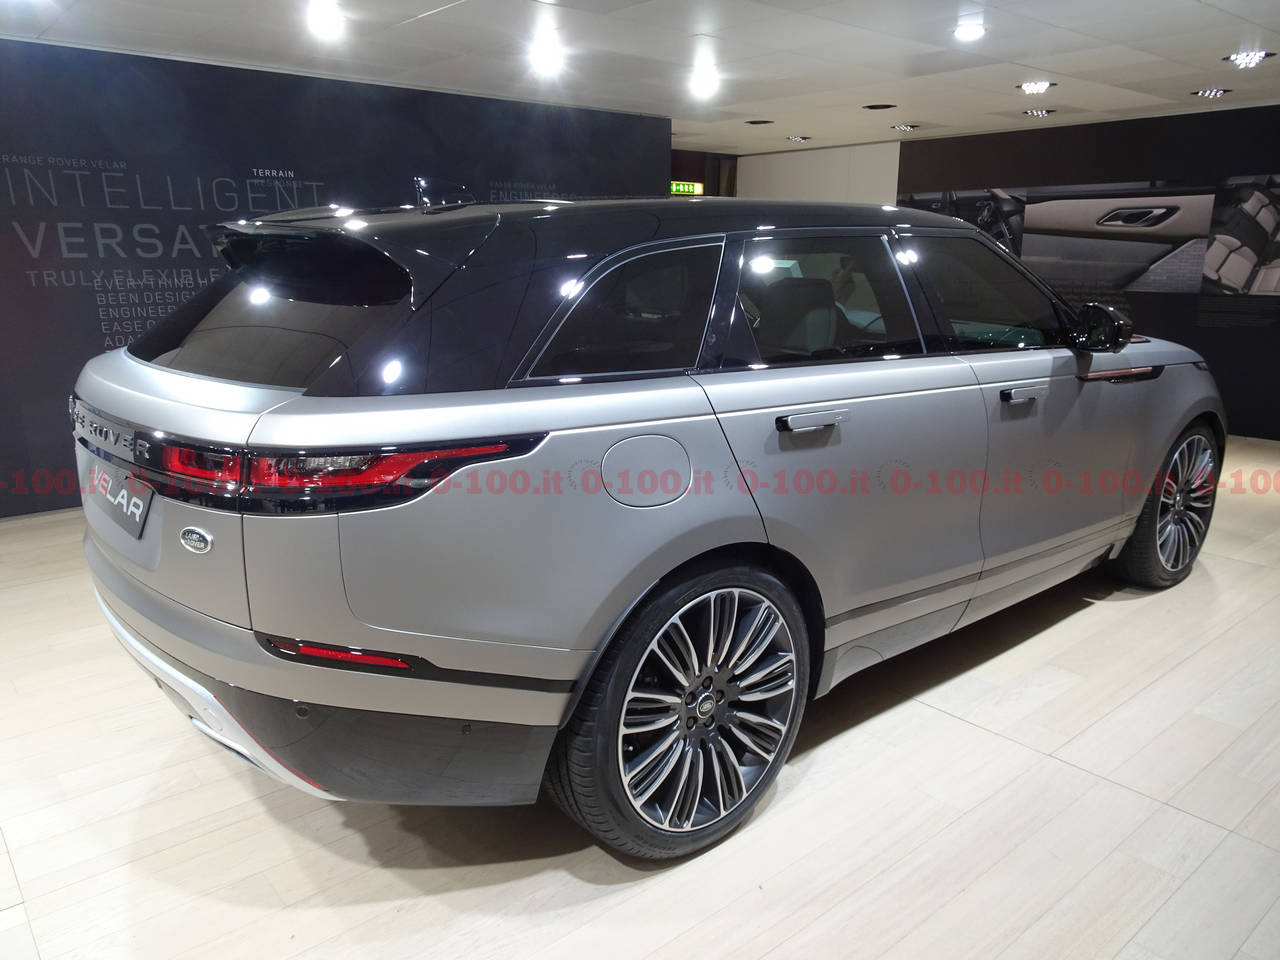 geneva-geneve-ginevra-2017-auto-show-range-rover-velar-0-100_9